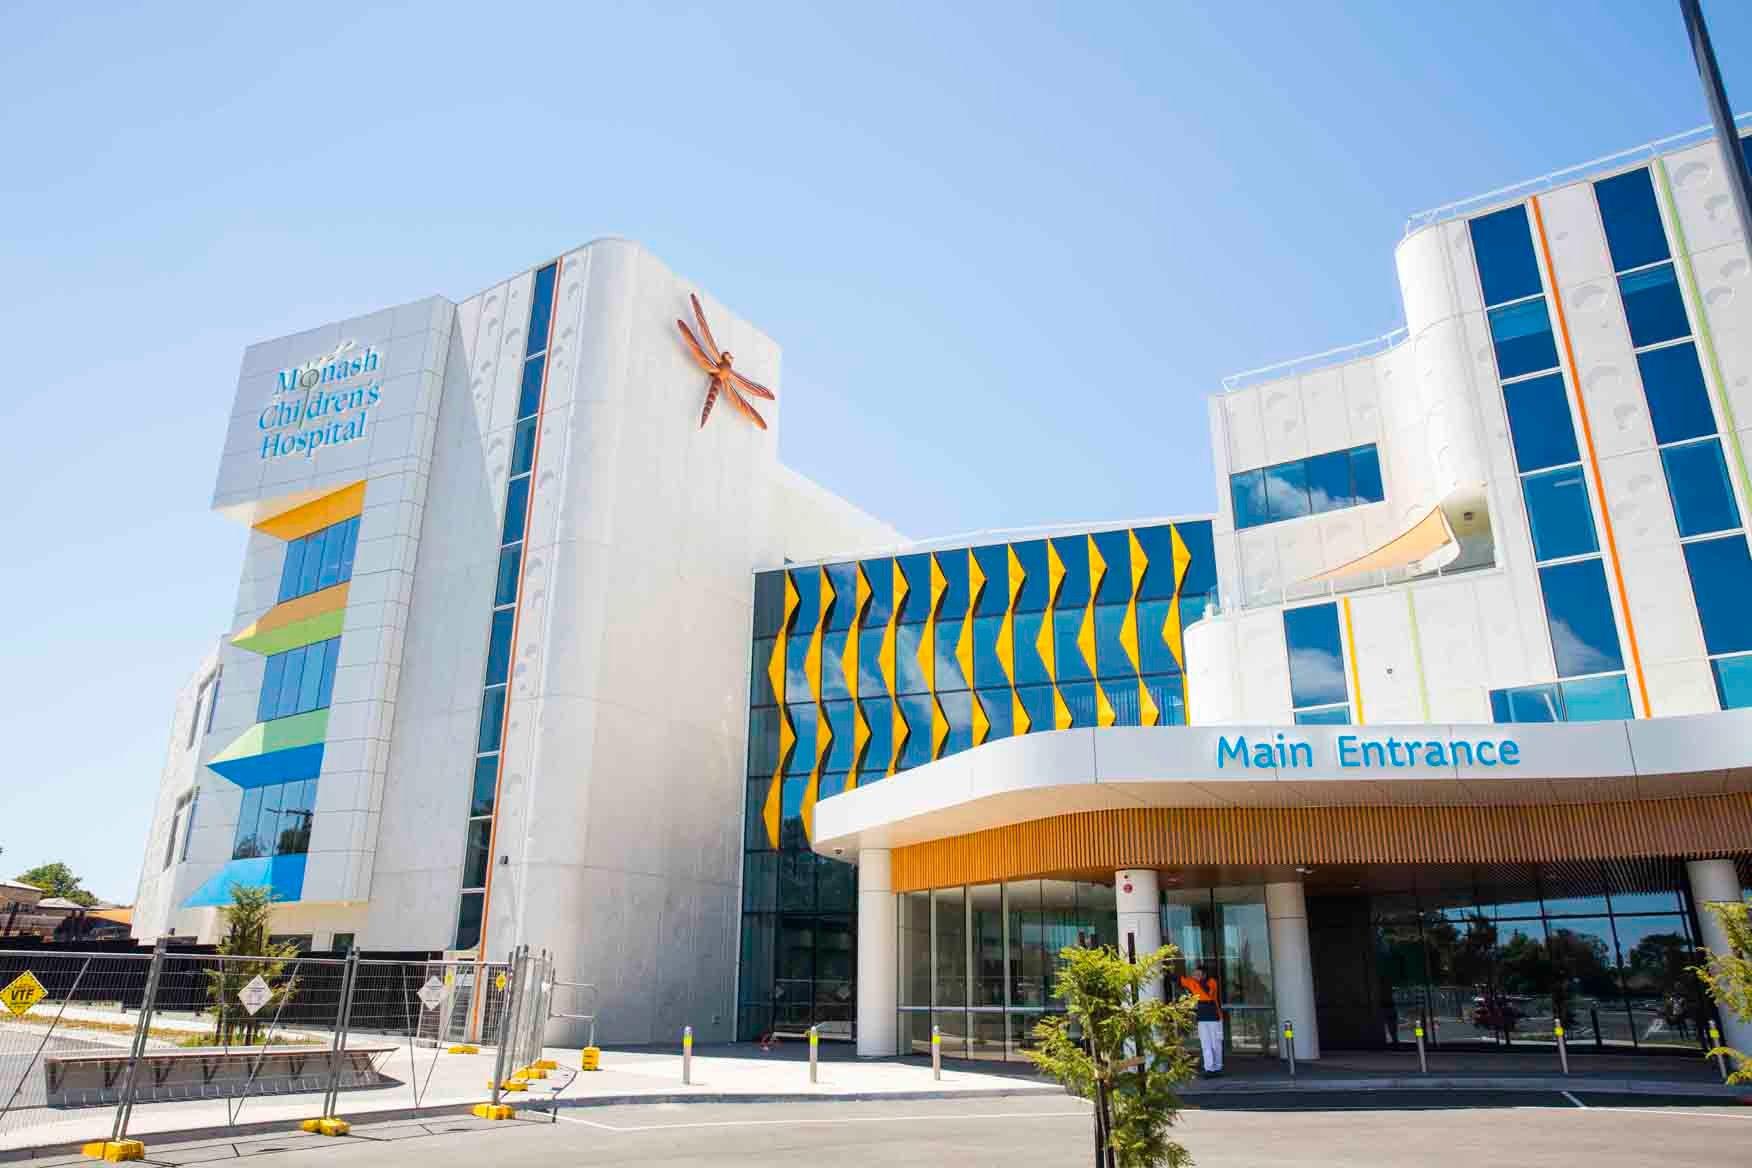 Monash Childrens Hospital.jpg